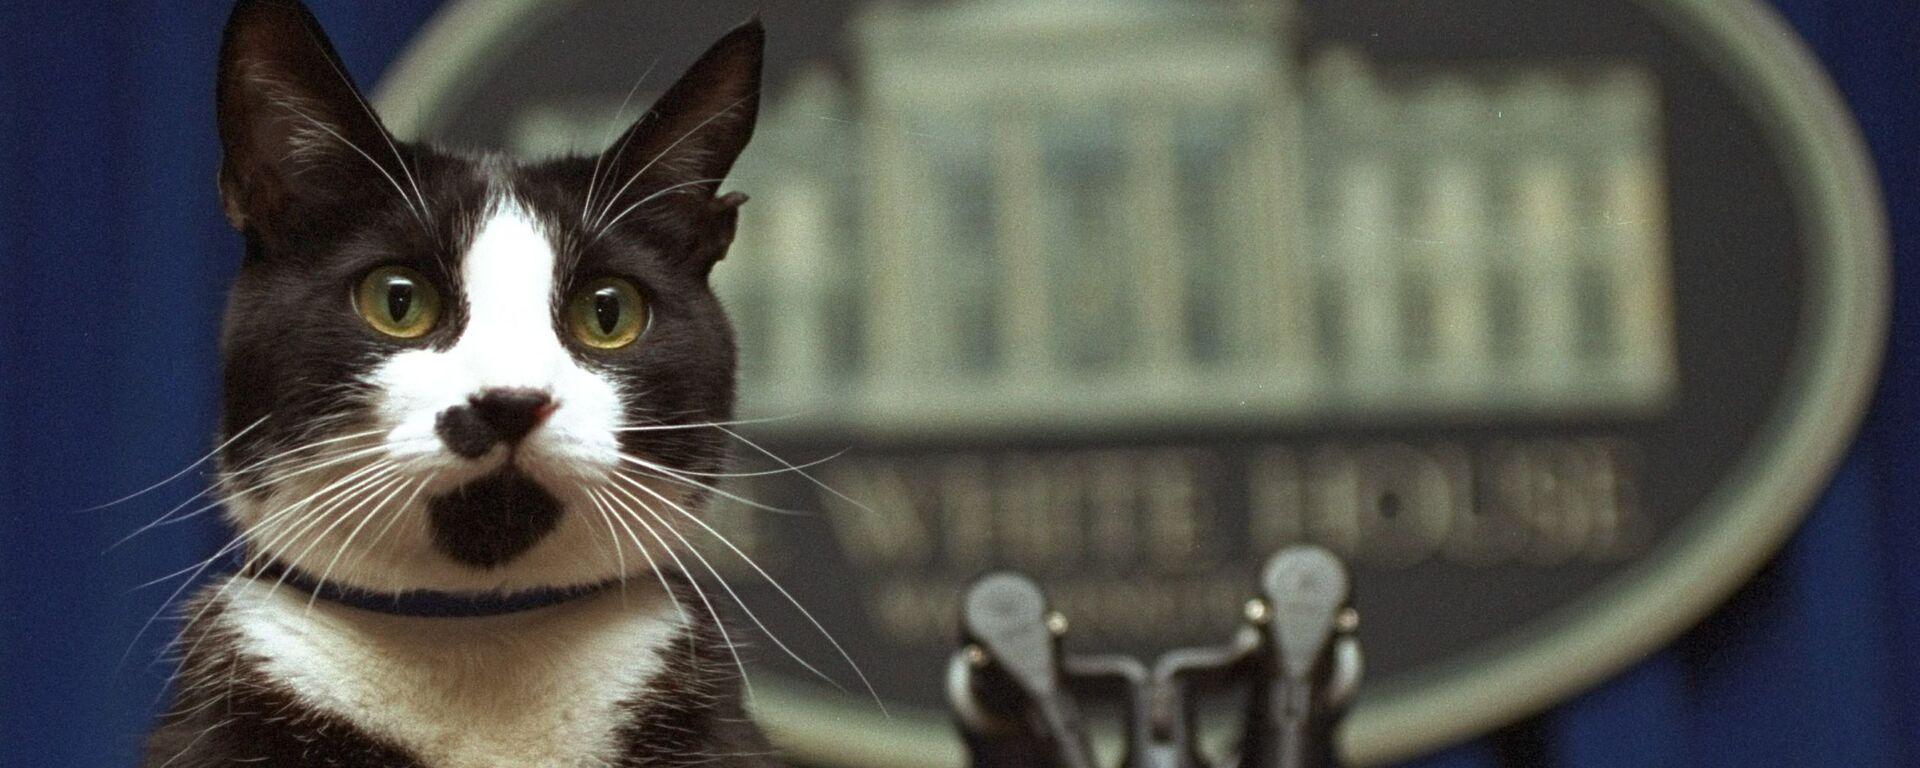 Кот президента Билла Клинтона Сокс смотрит на трибуну в зале для брифингов Белого дома в Вашингтоне - Sputnik Italia, 1920, 08.08.2021